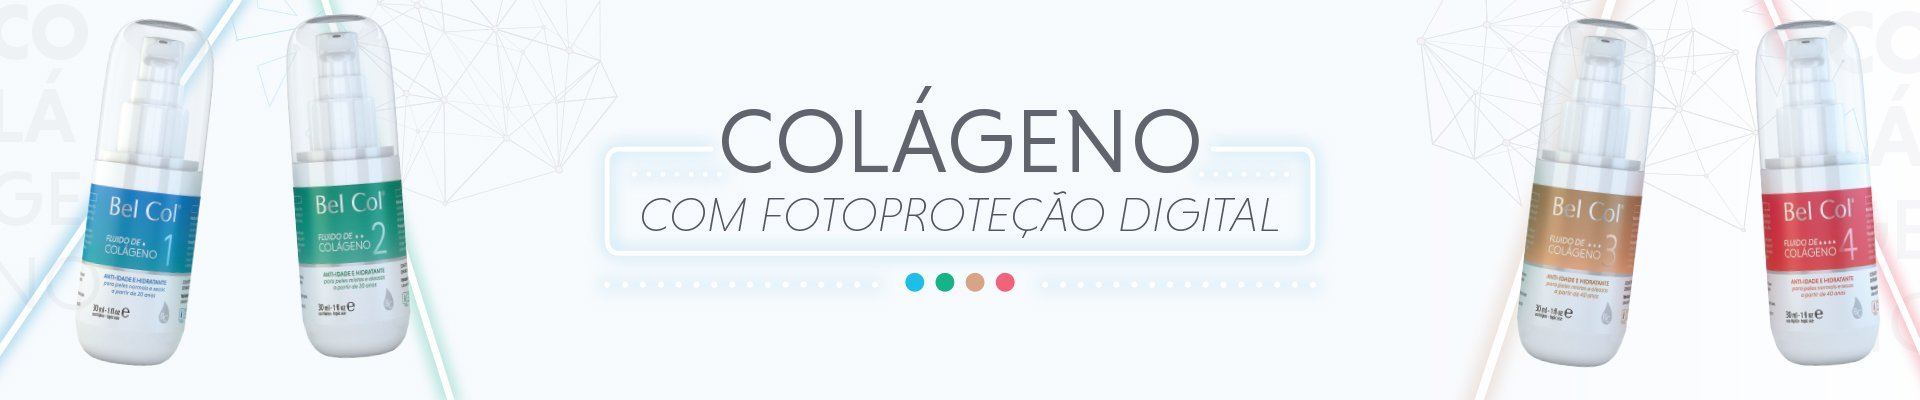 Fluidos de Colágeno